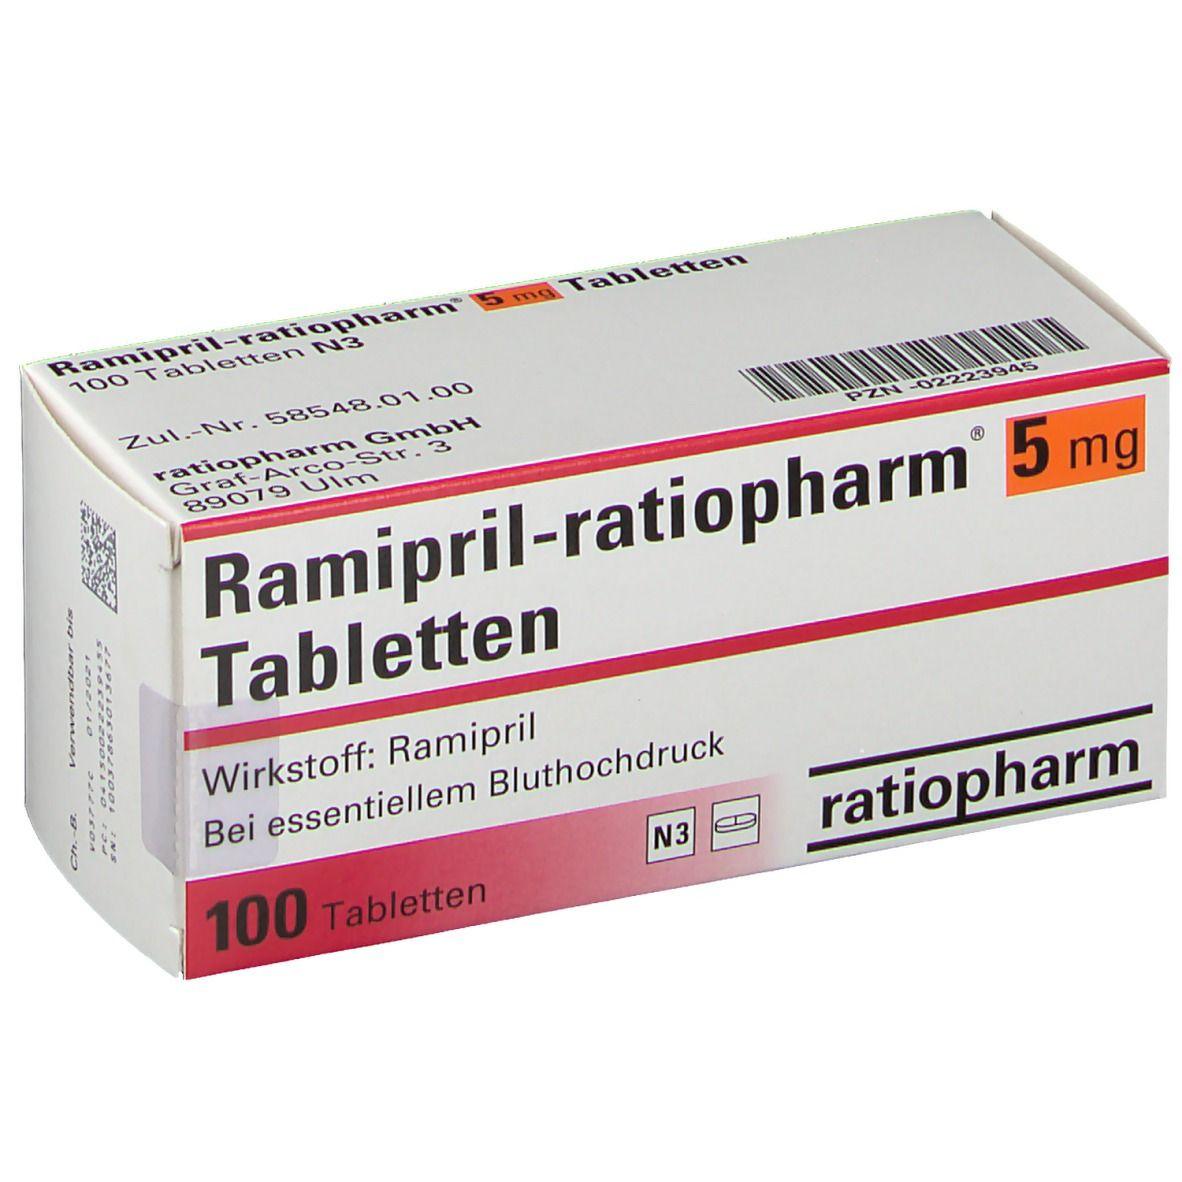 Ramipril ratiopharm® 5 mg Tabl.